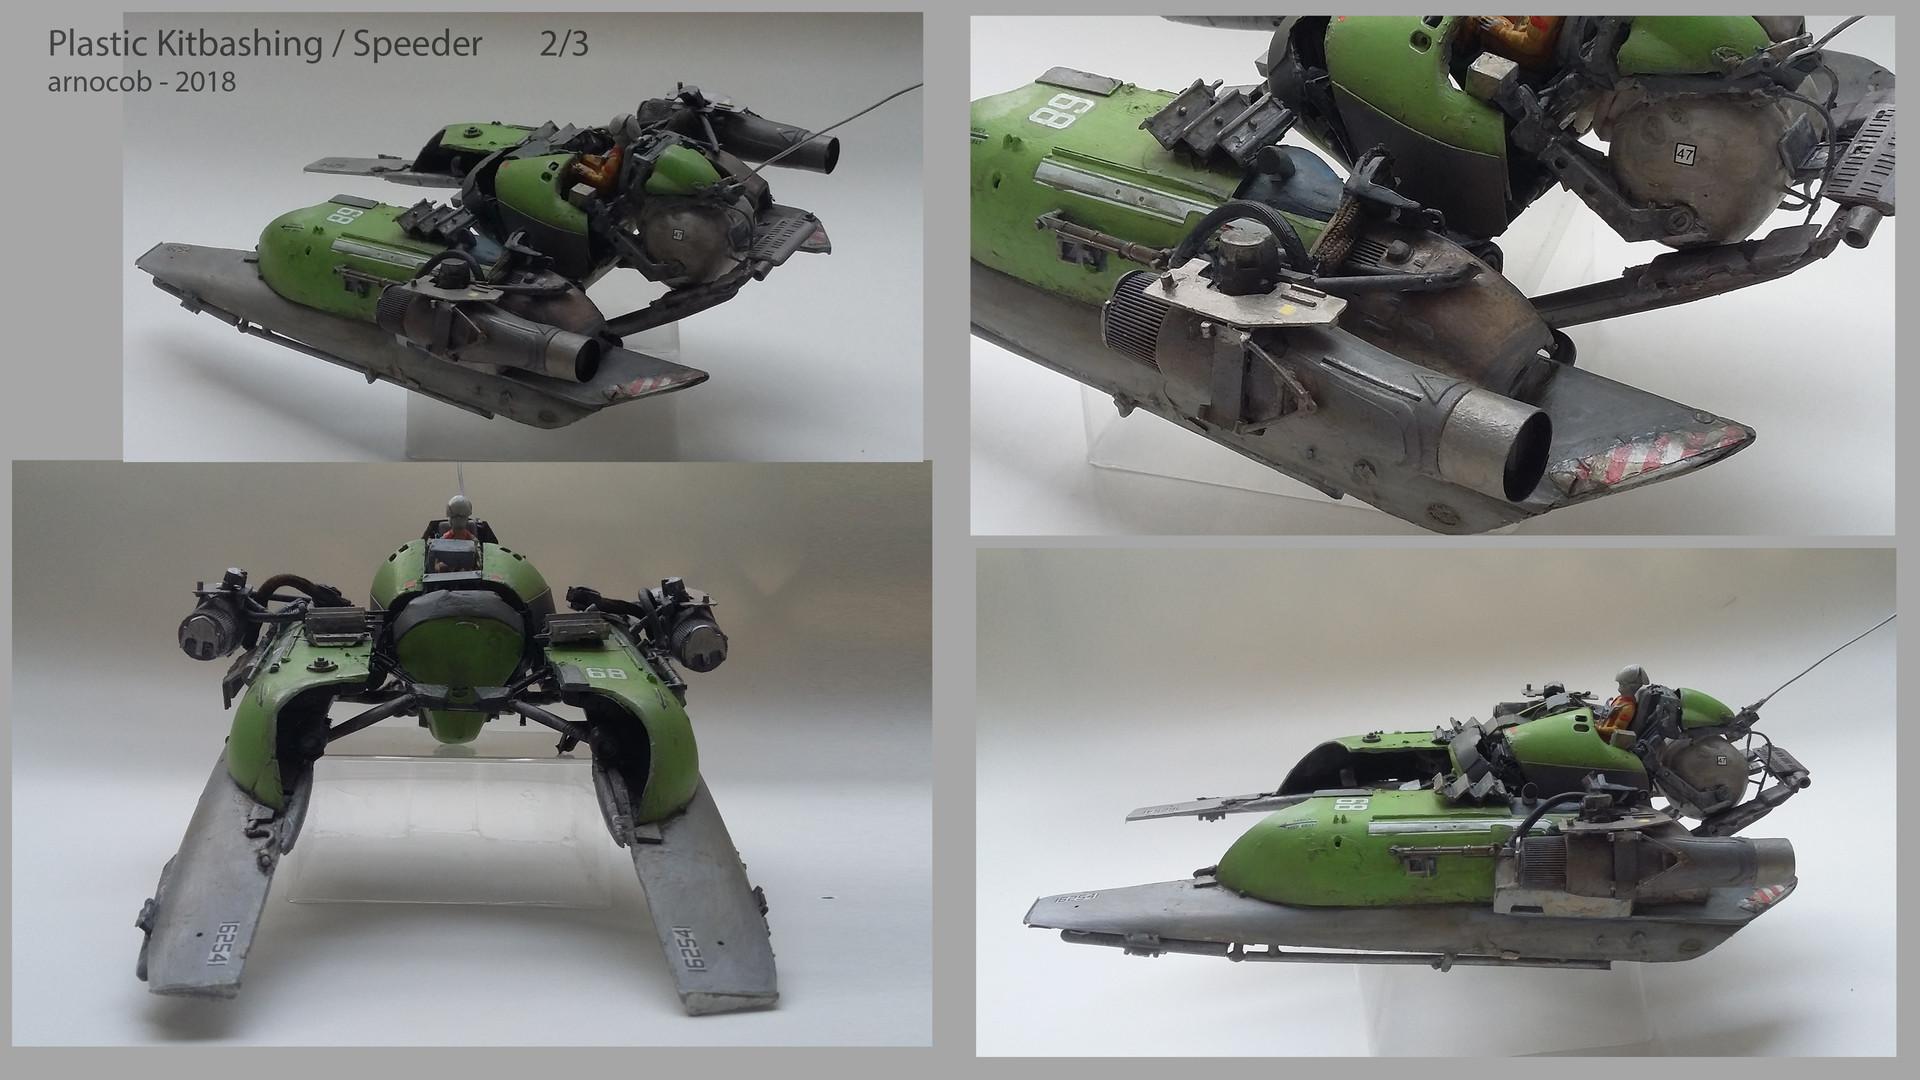 Arnaud caubel plastickitbashing speeder arnocob 02